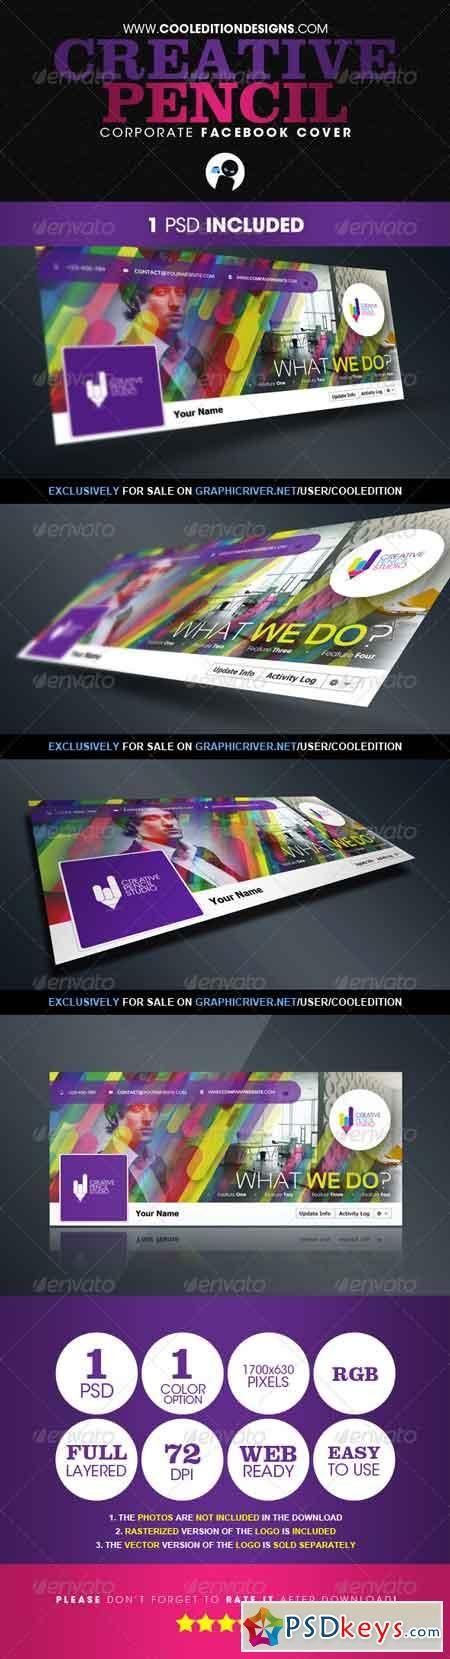 Creative Pencil - Corporate Facebook Cover 2855089